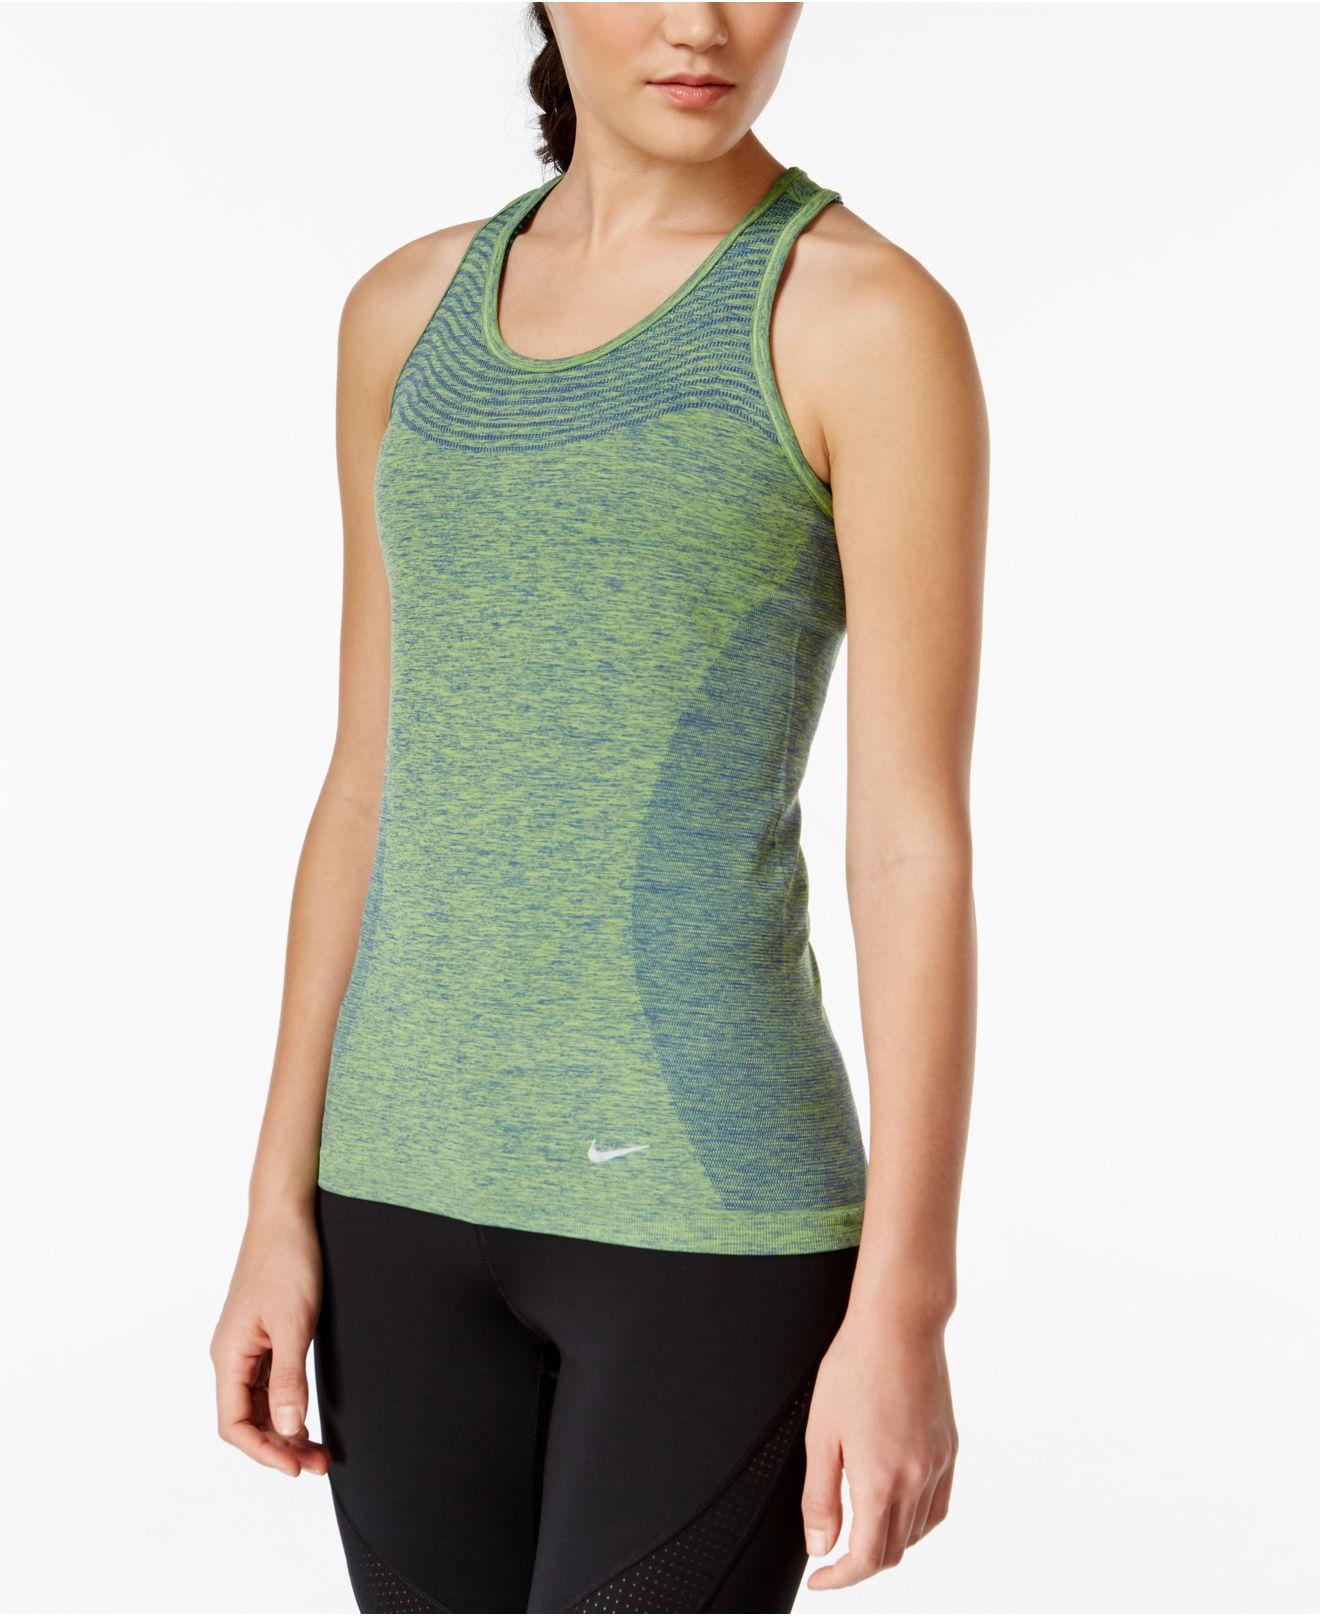 9a68d5392ed43 Lyst - Nike Women s Dri-fit Knit Running Tank Top in Green